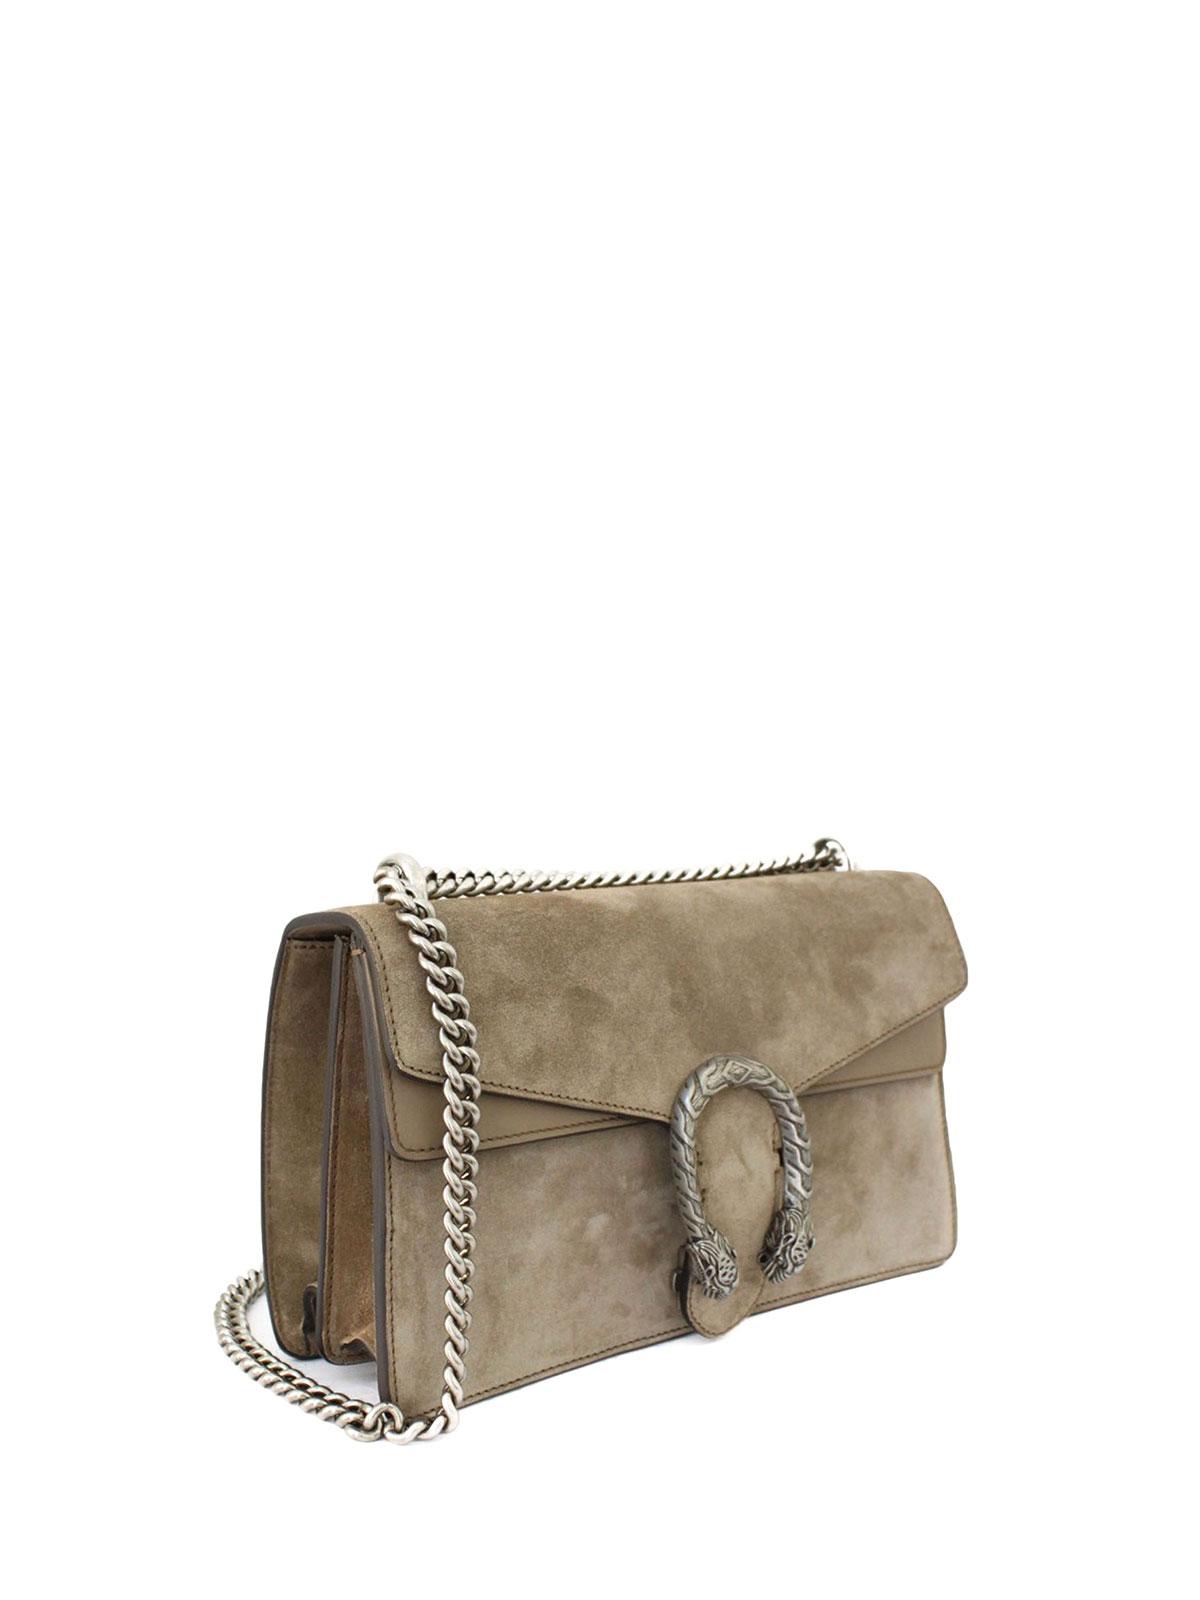 7403f38e57b2 Gucci - Dionysus shoulder bag - shoulder bags - 400249 CEMMN 2807